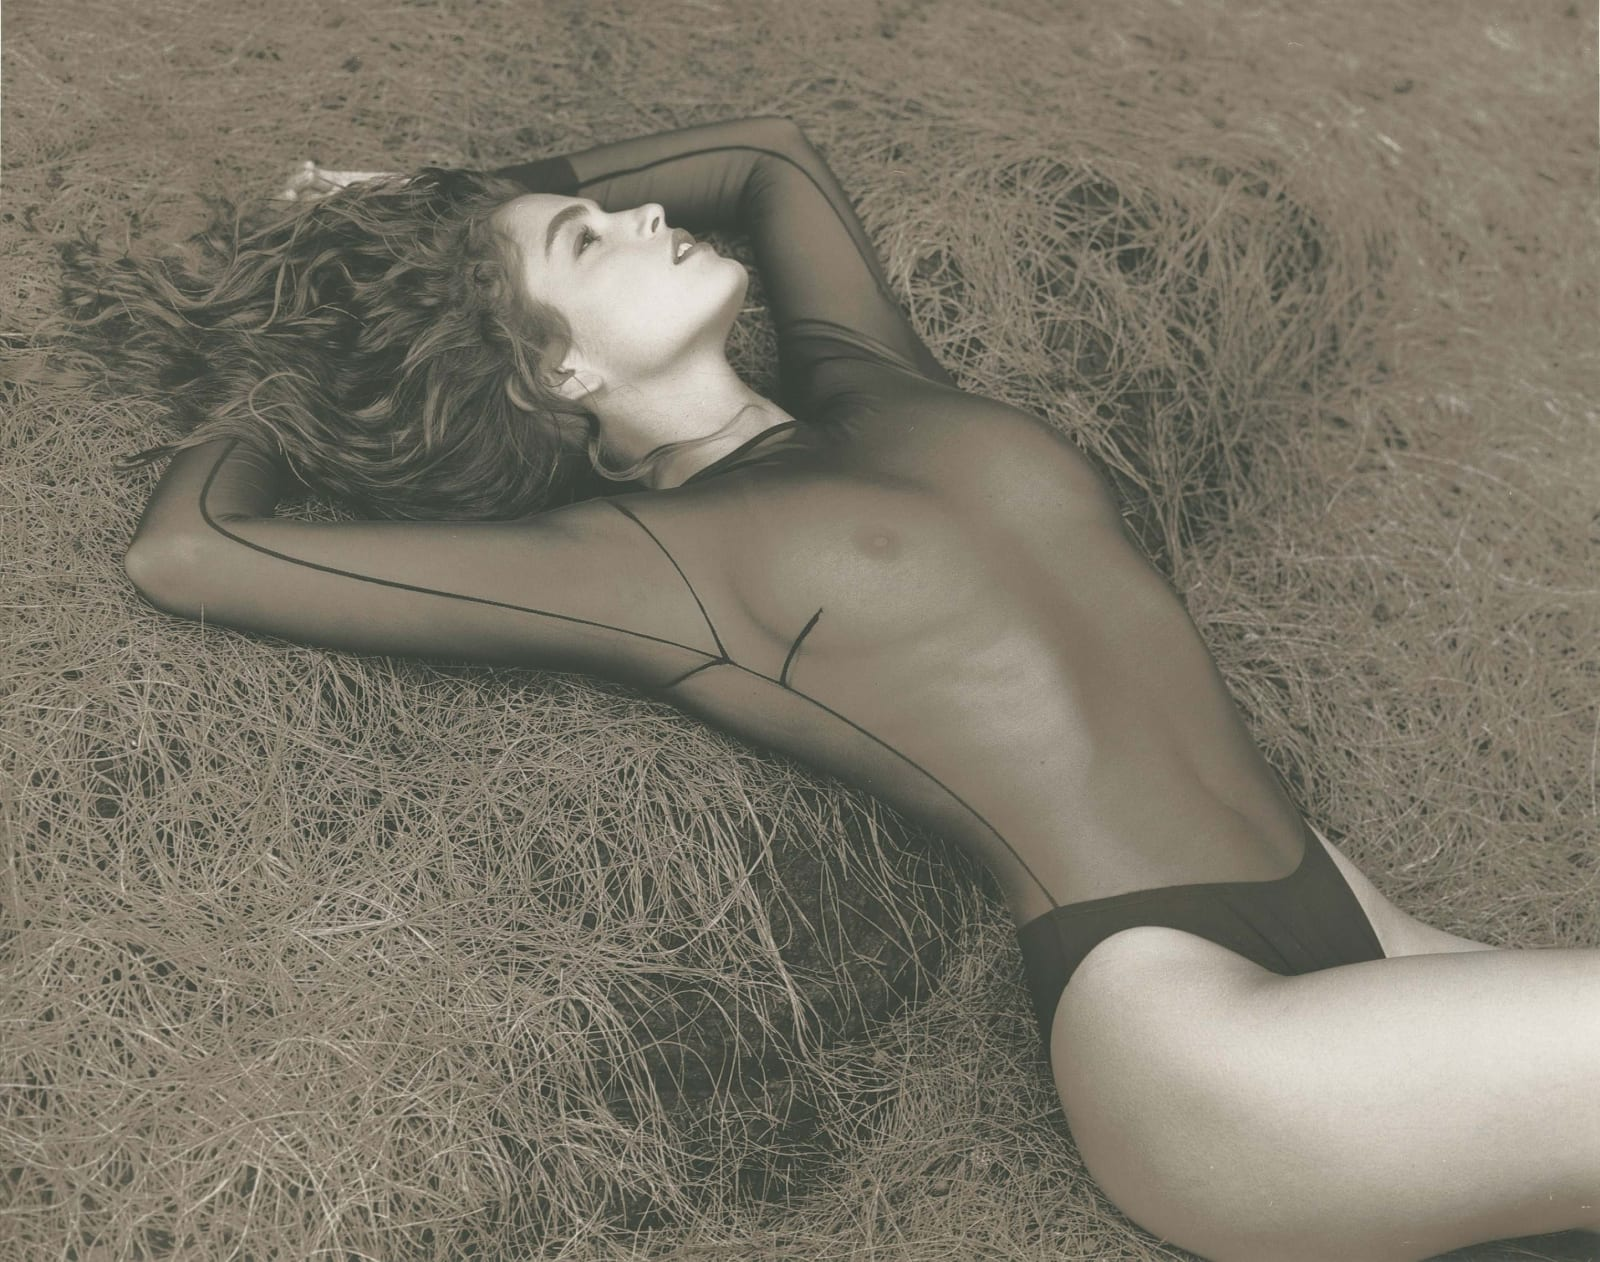 Herb Ritts, Cindy Crawford, Hawaii, 1988